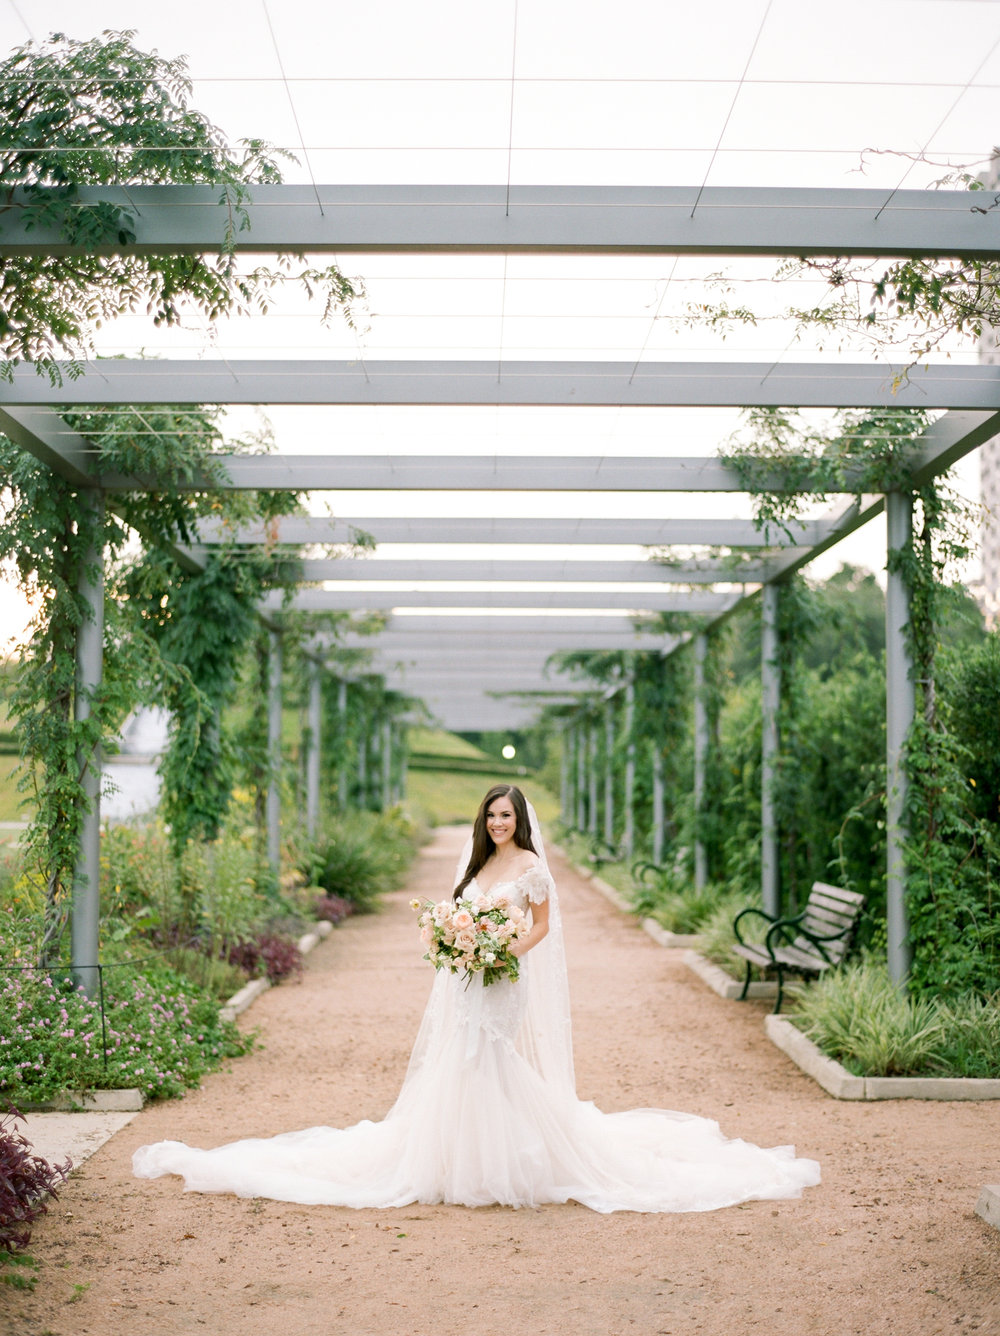 Fine-Art-Film-Houston-Wedding-Photographer-Best-Top-Luxury-Texas-Austin-Dallas-Destination-Dana-Fernandez-Photography-Portrait-Bridals-McGovern-Centennial-Gardens-1.jpg